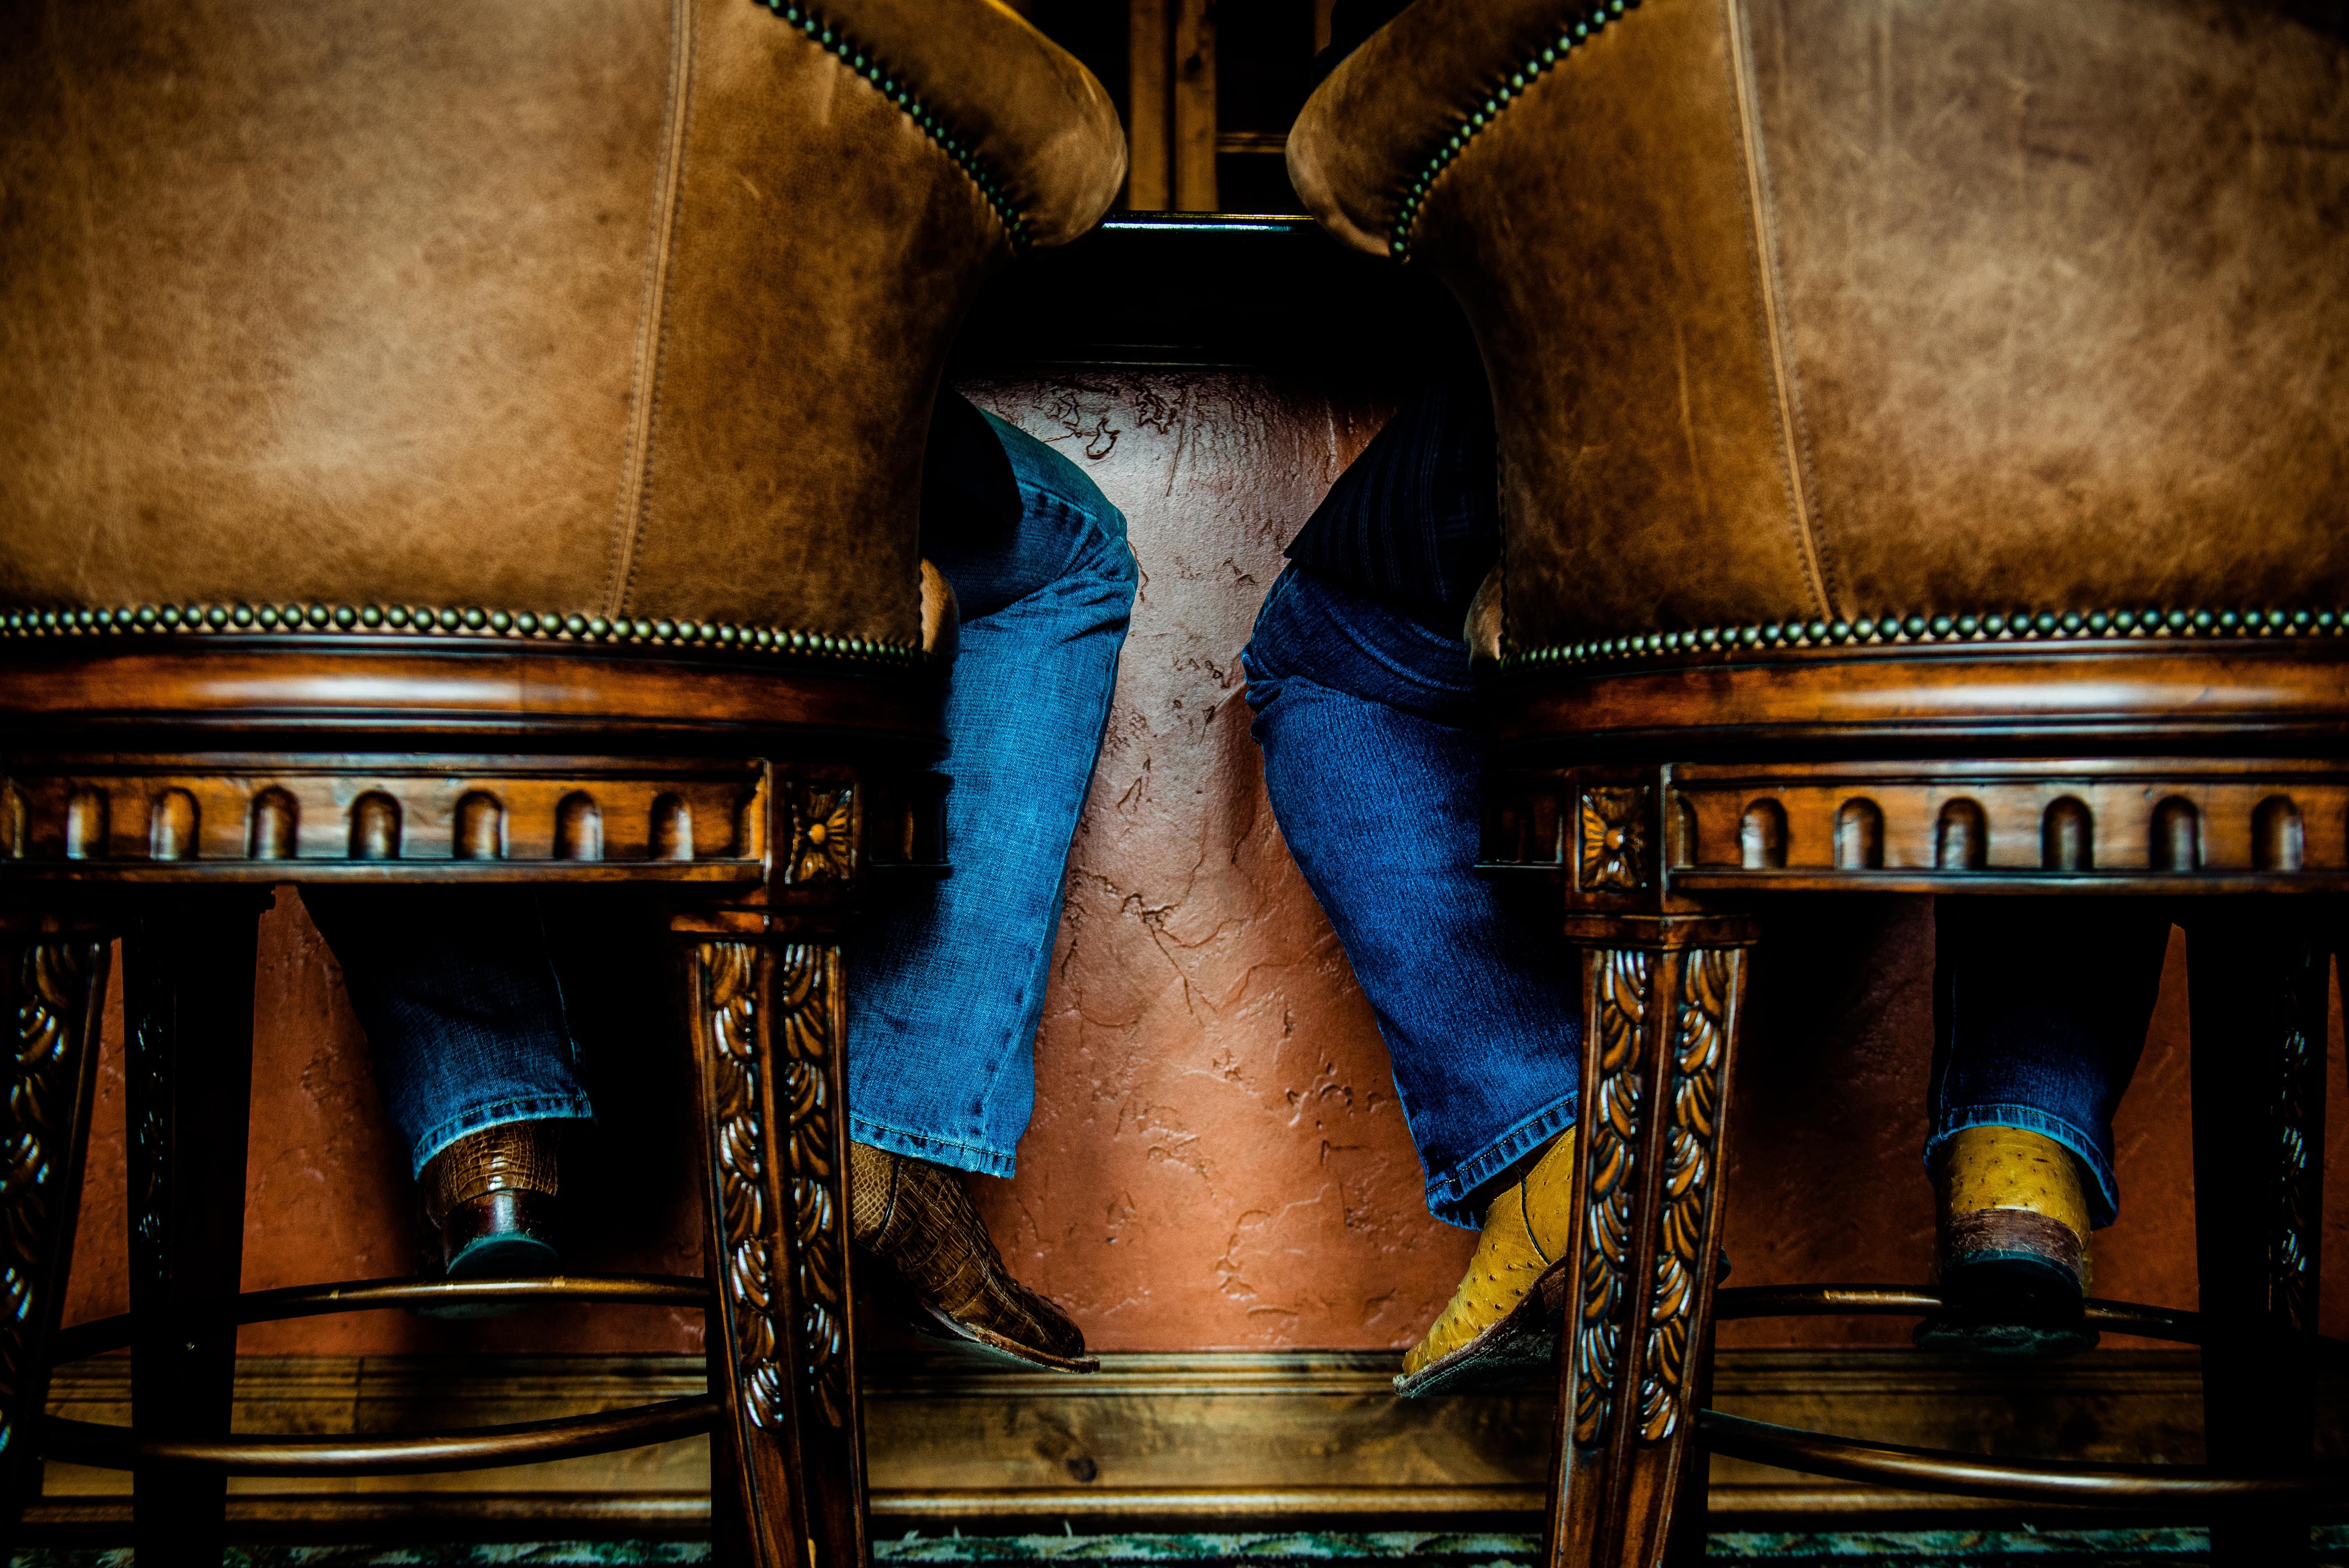 Men sitting at a bar